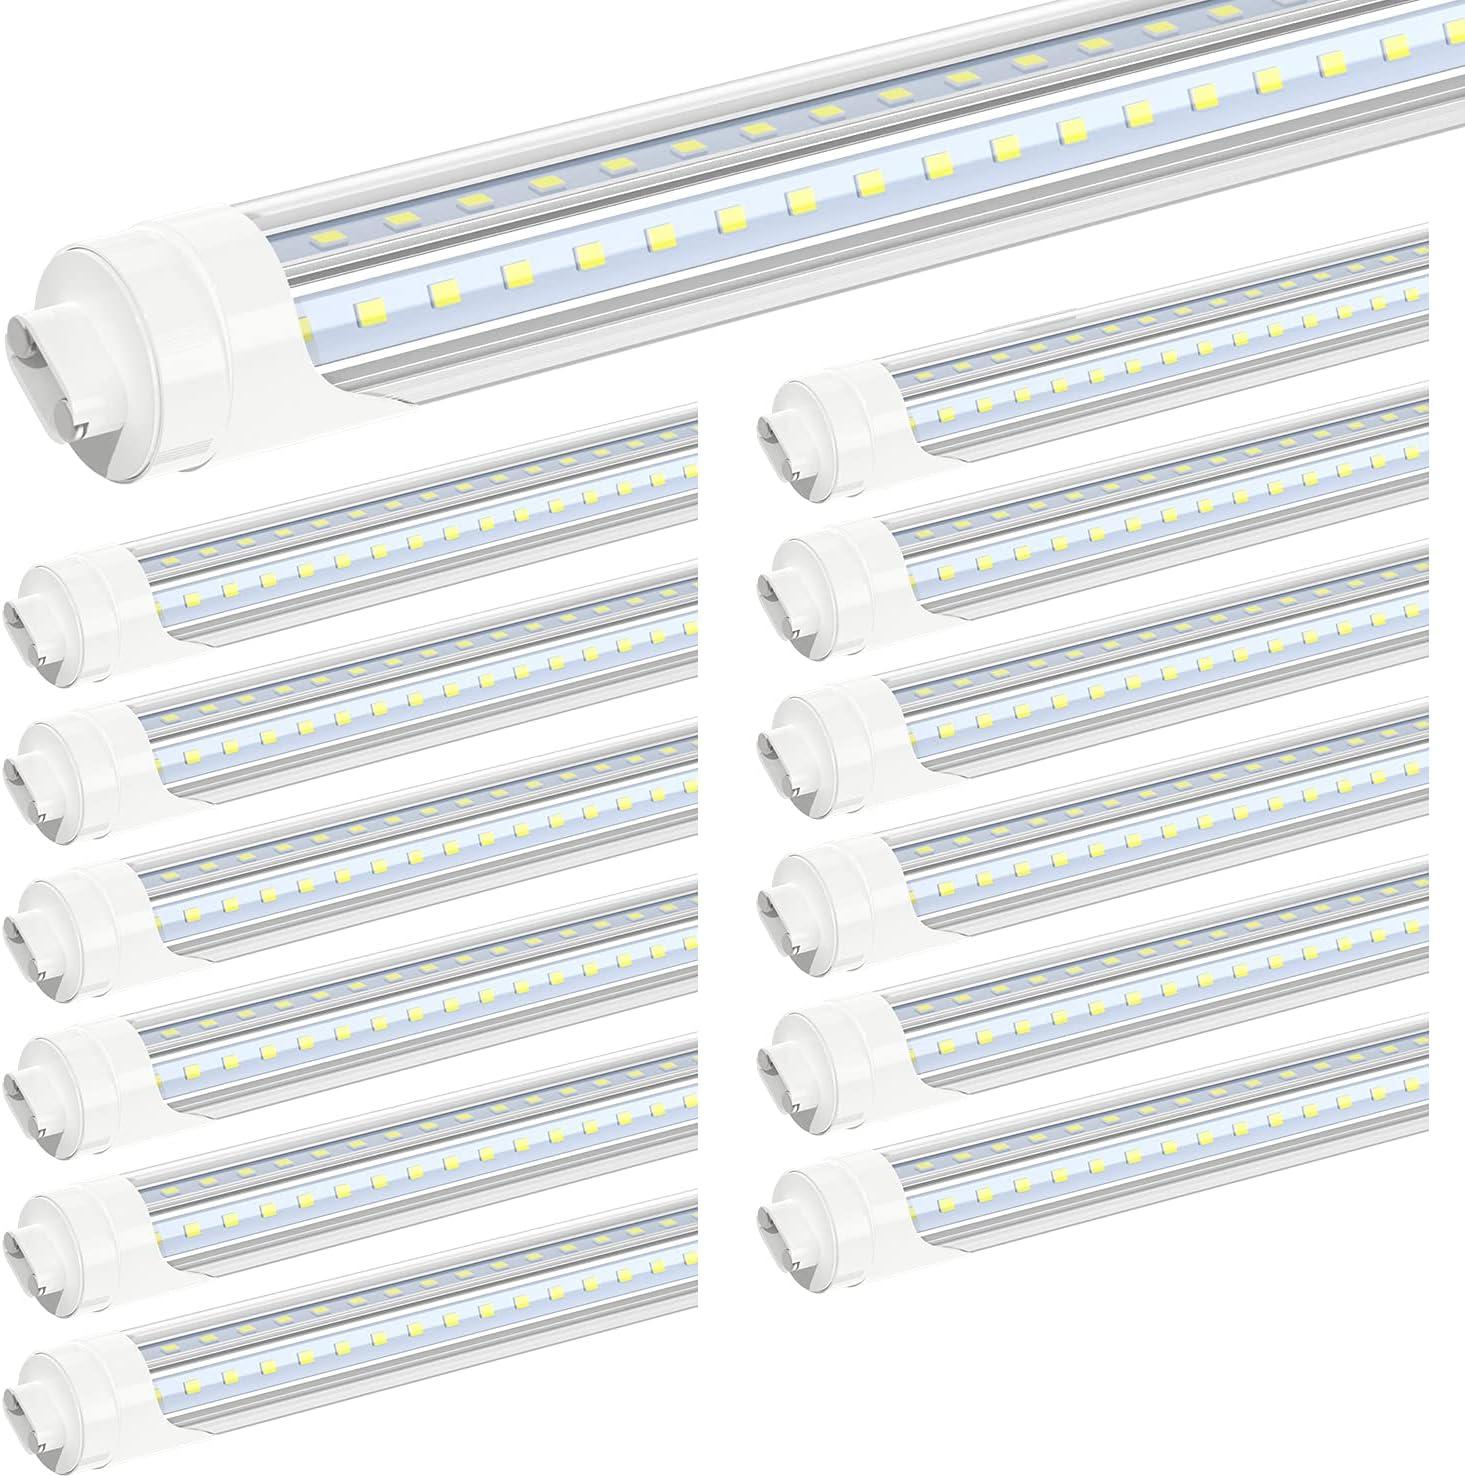 JESLED R17D HO 8FT LED Bulbs - Very popular Rotate V 12 5000K D Shape High quality Pack